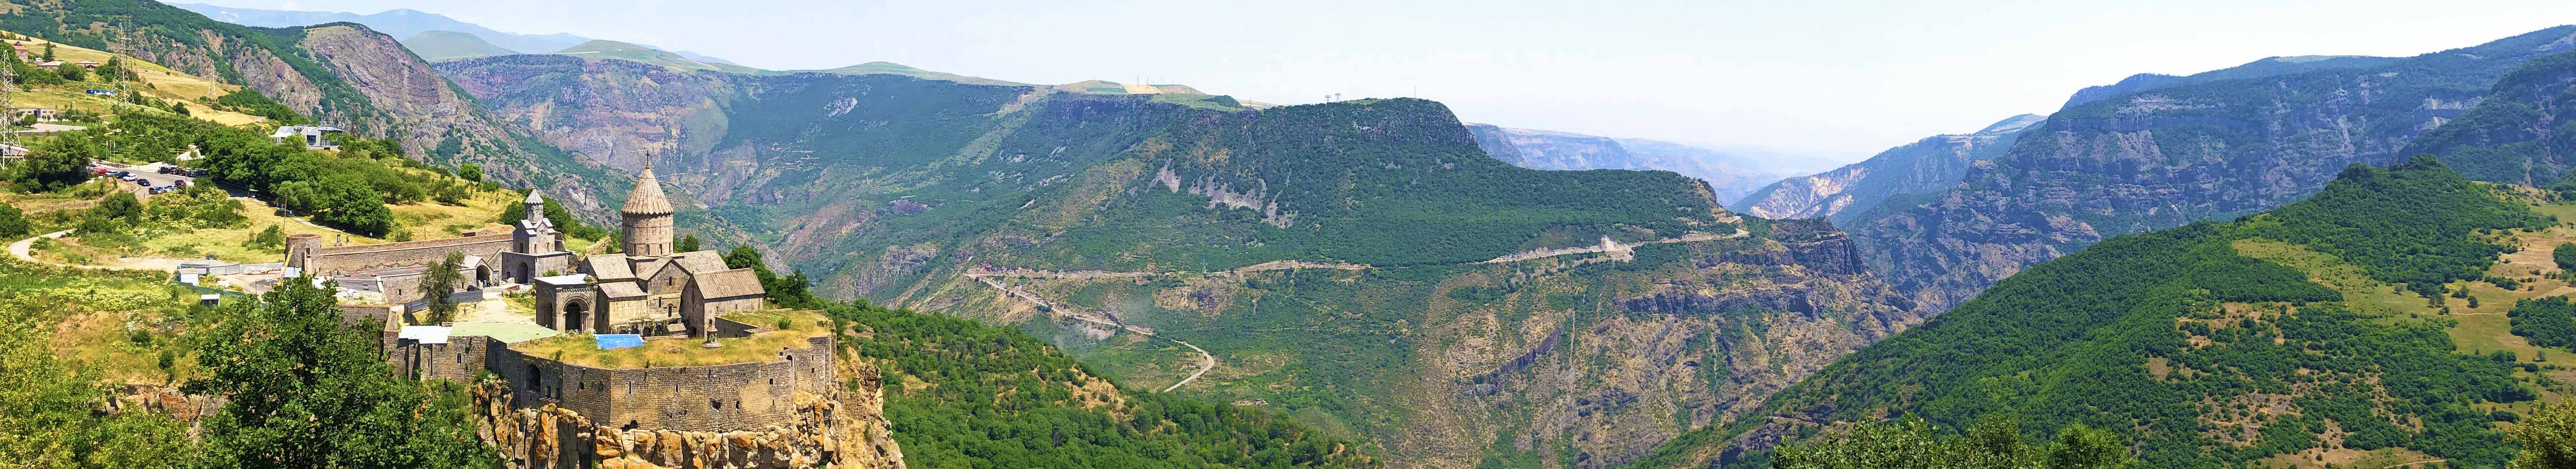 Знакомство с Арменией <br> Ереван – Гарни – Гегард